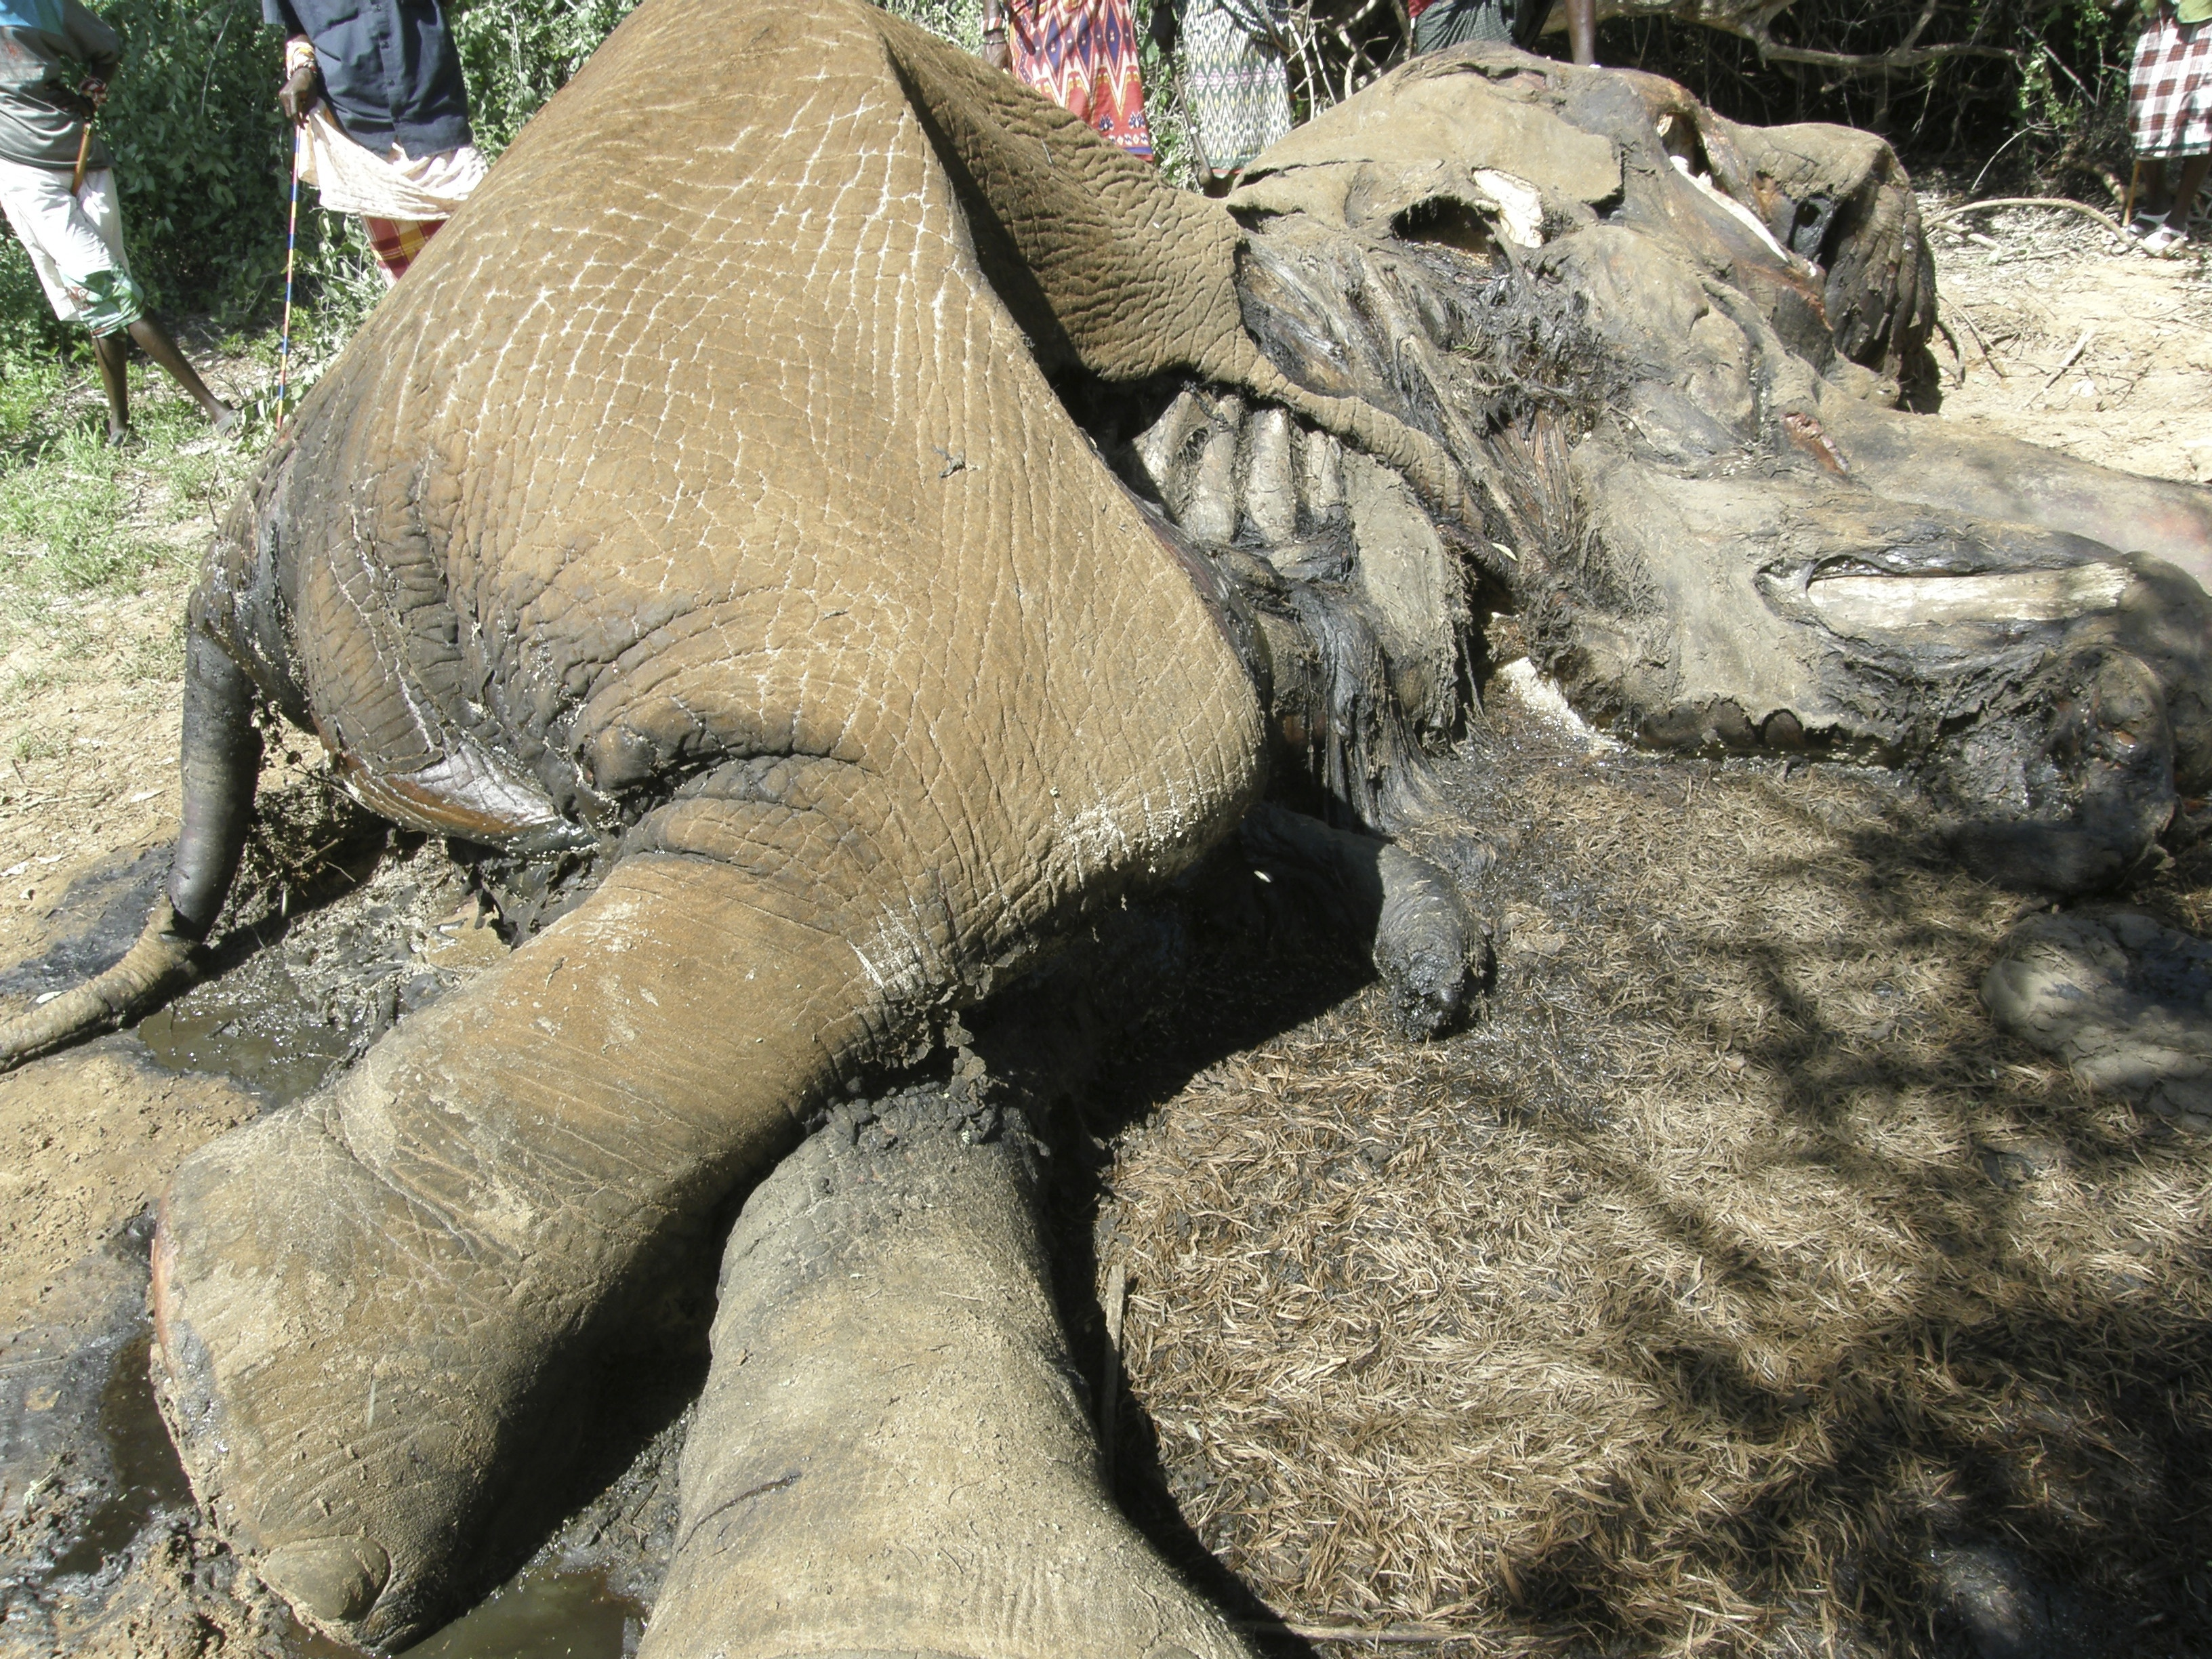 a killed by poacher